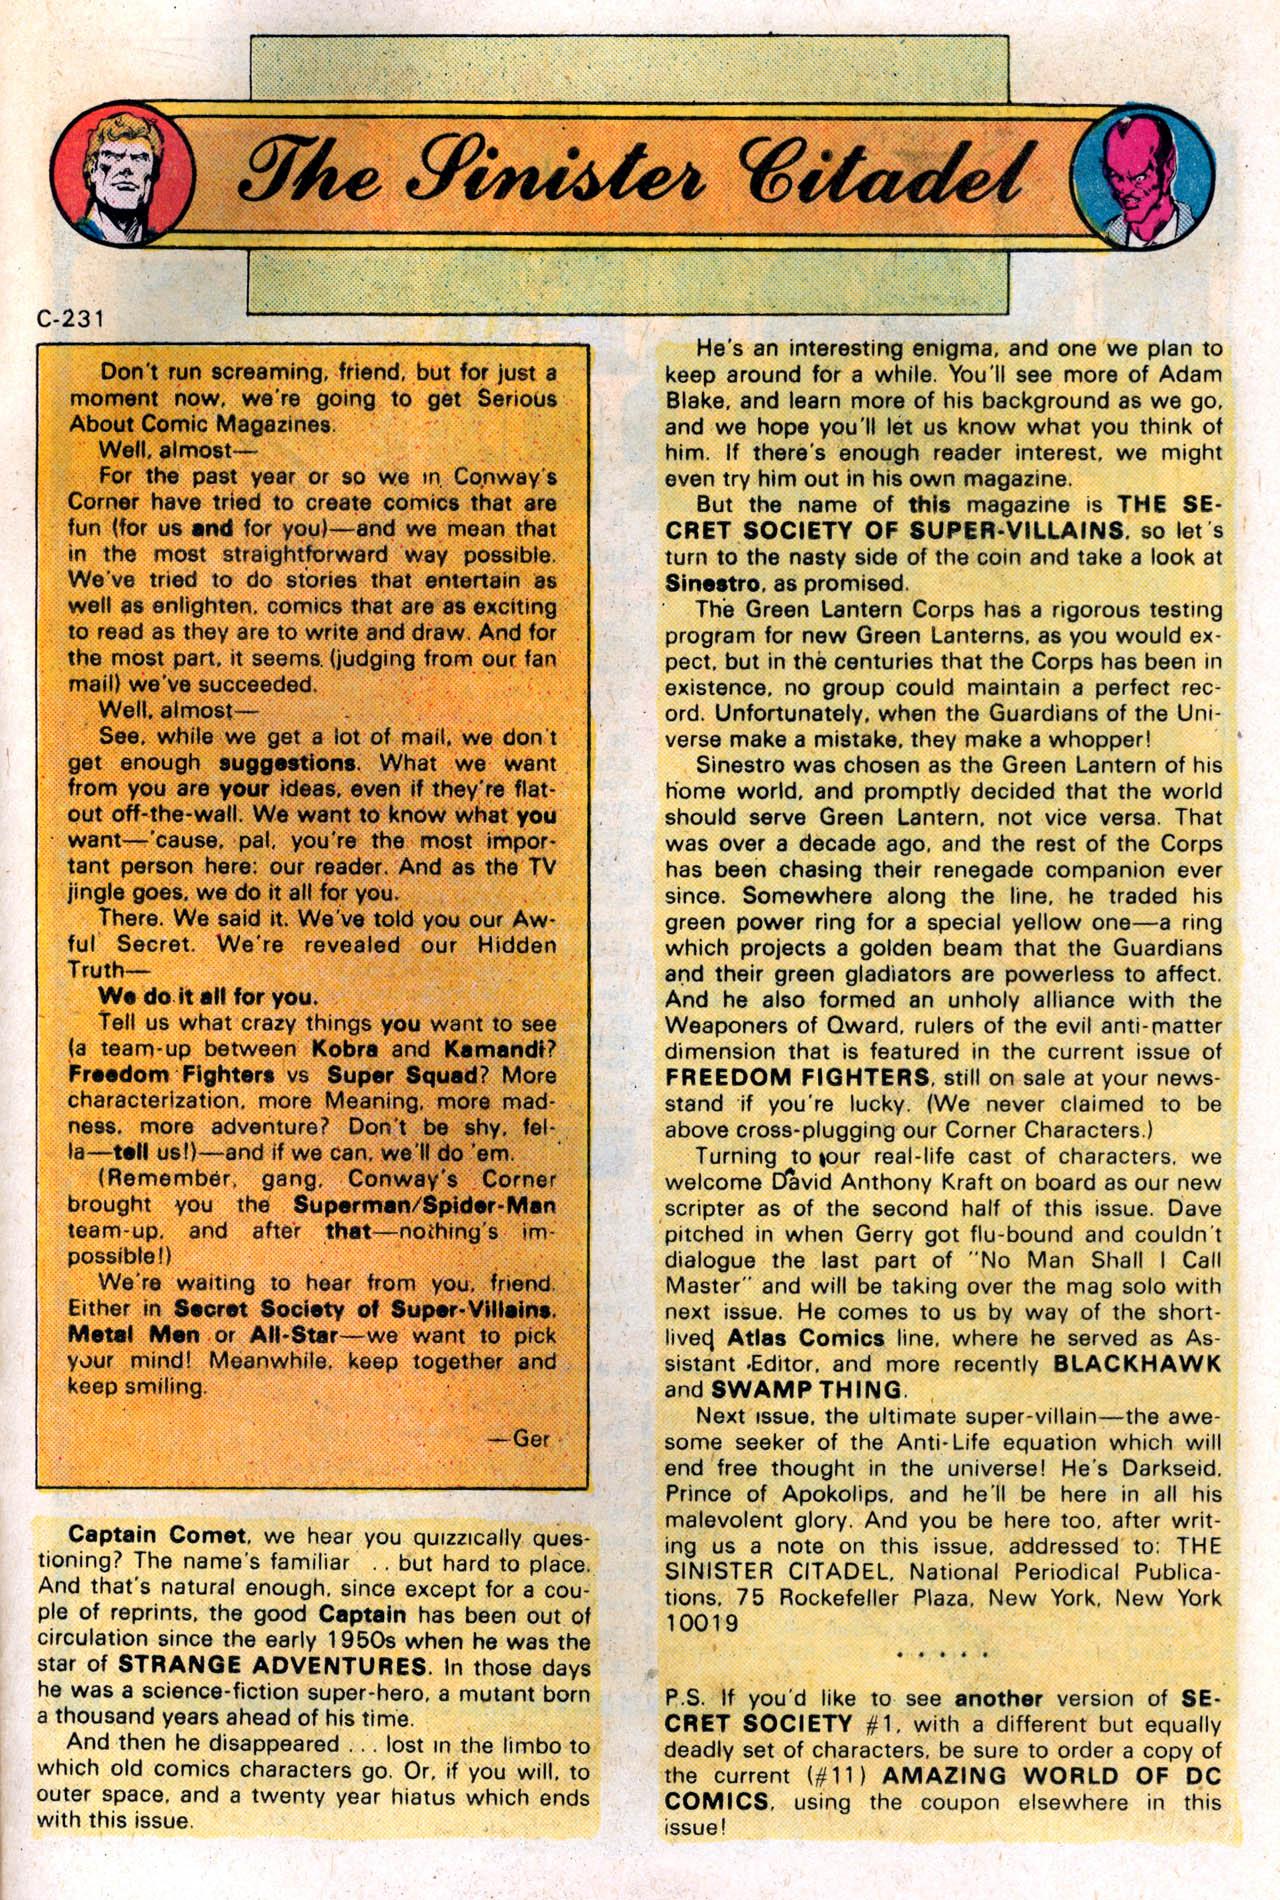 Read online Secret Society of Super-Villains comic -  Issue #2 - 33